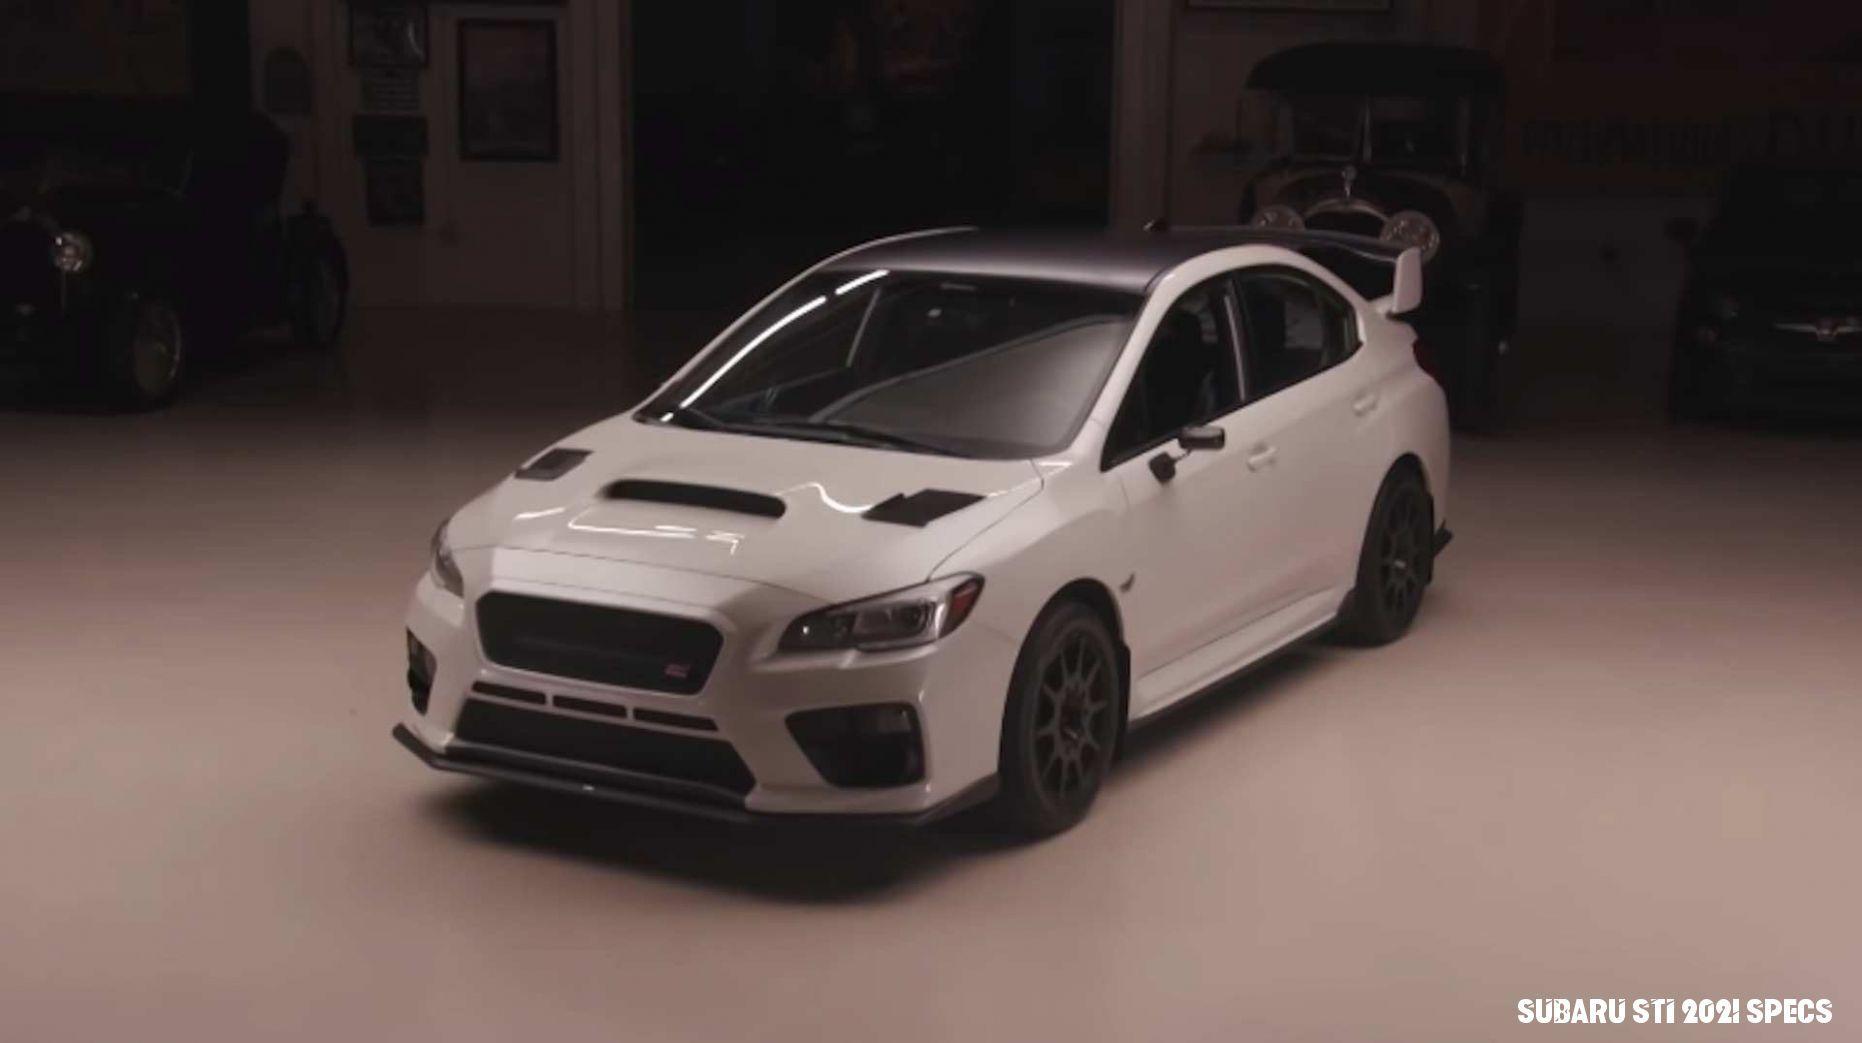 Subaru Sti 2021 Specs Picture in 2020 | Subaru brz sti ...